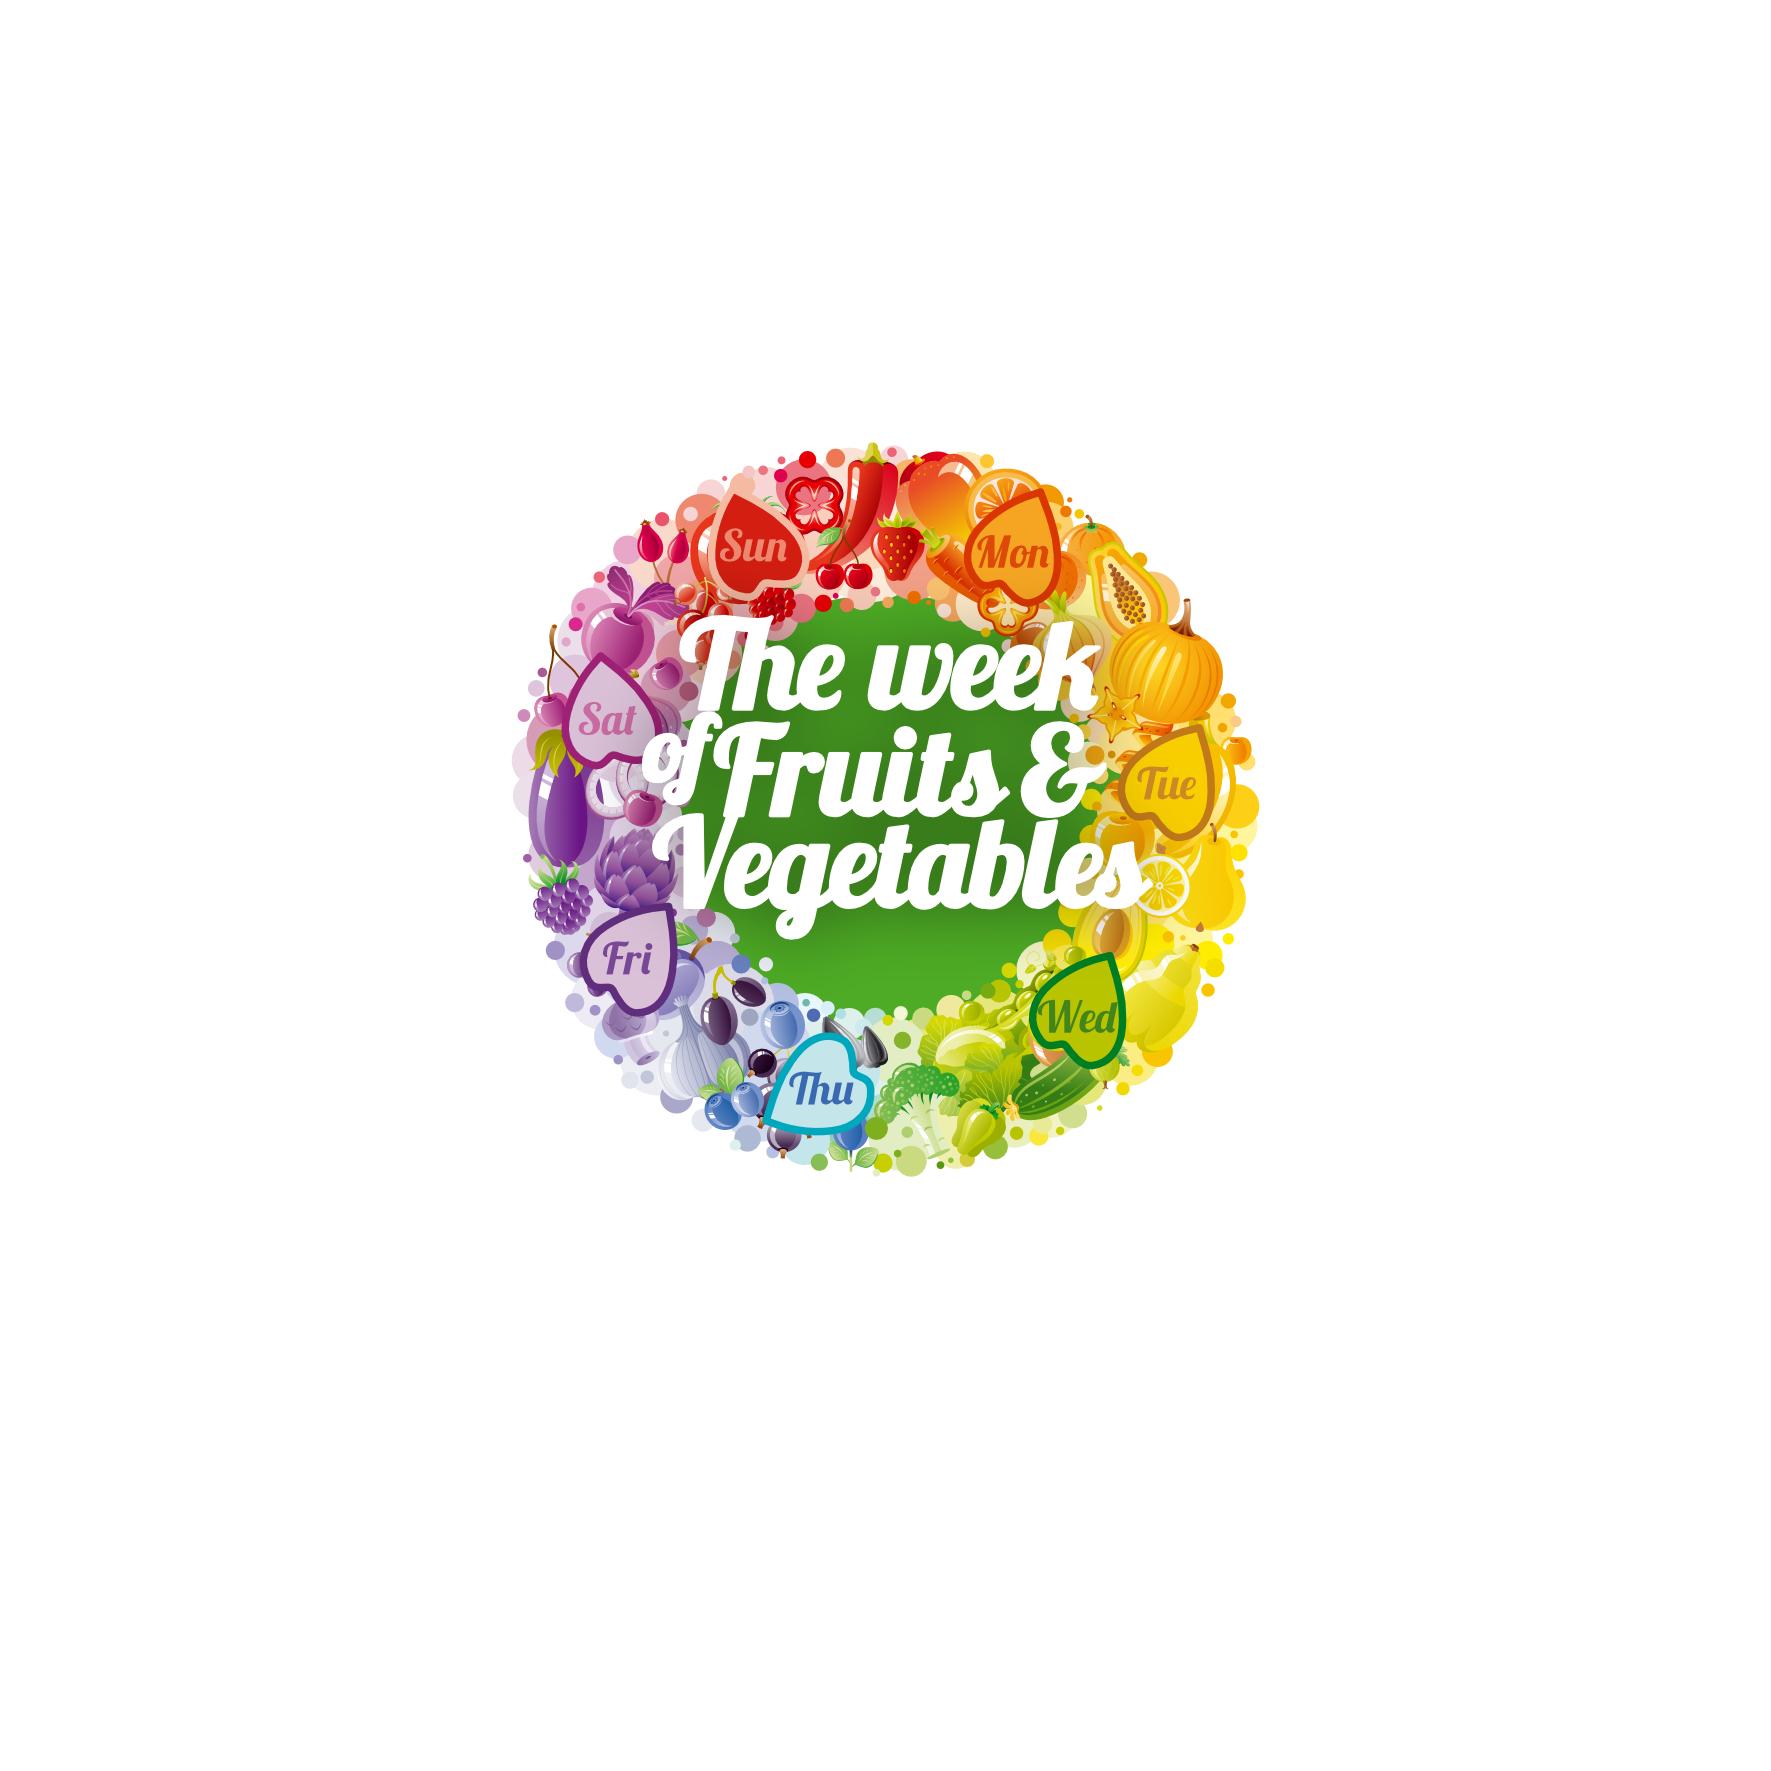 LOGO WEEK OF VEGETABLES & FRUITS